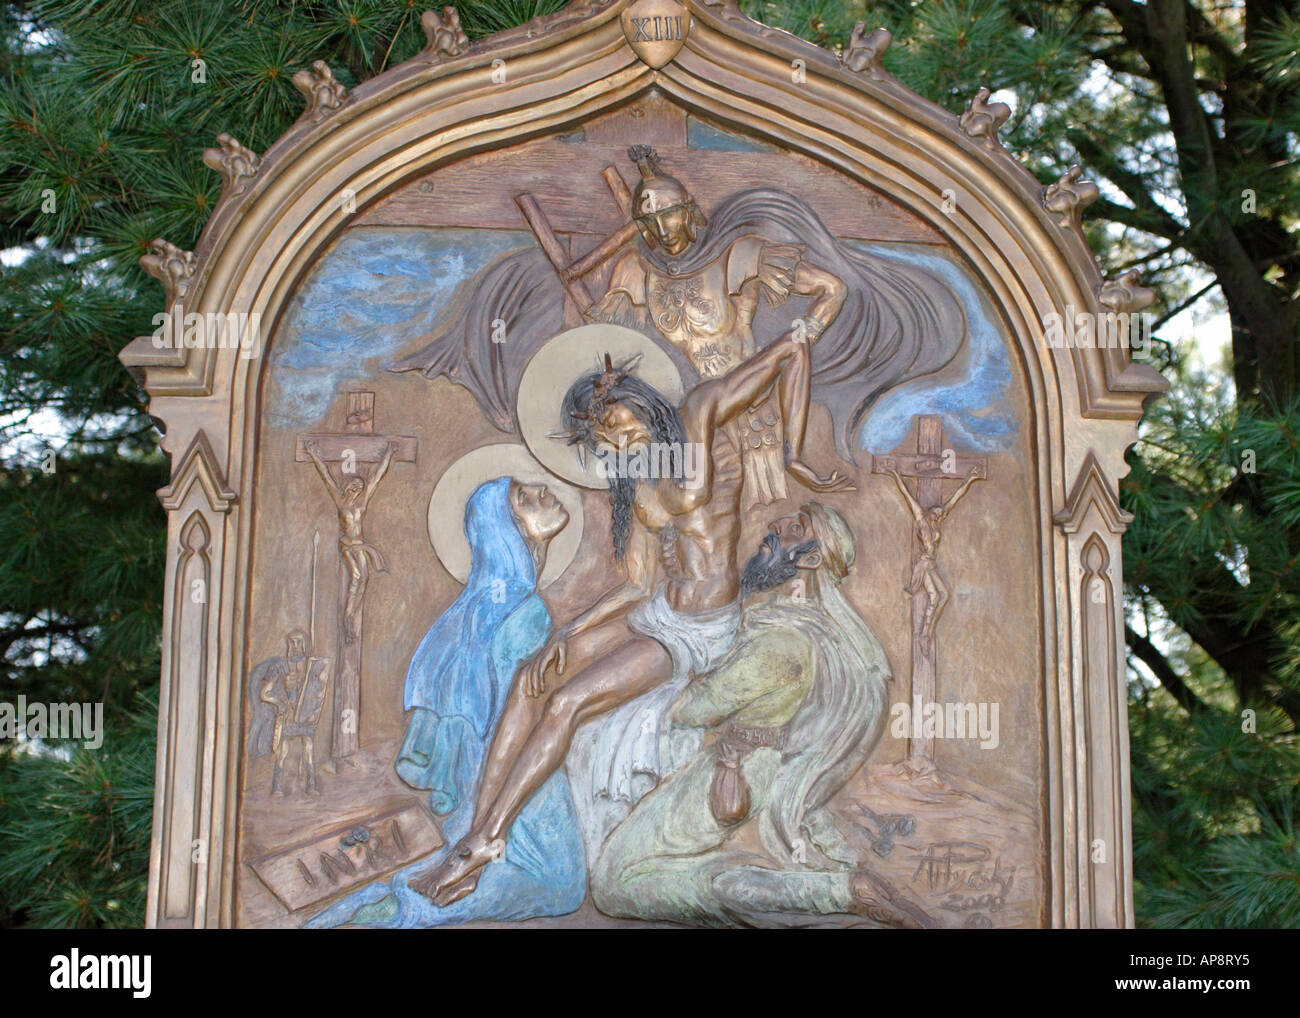 Jesus Christ Taken Down From The Cross Stockfotos & Jesus Christ ...